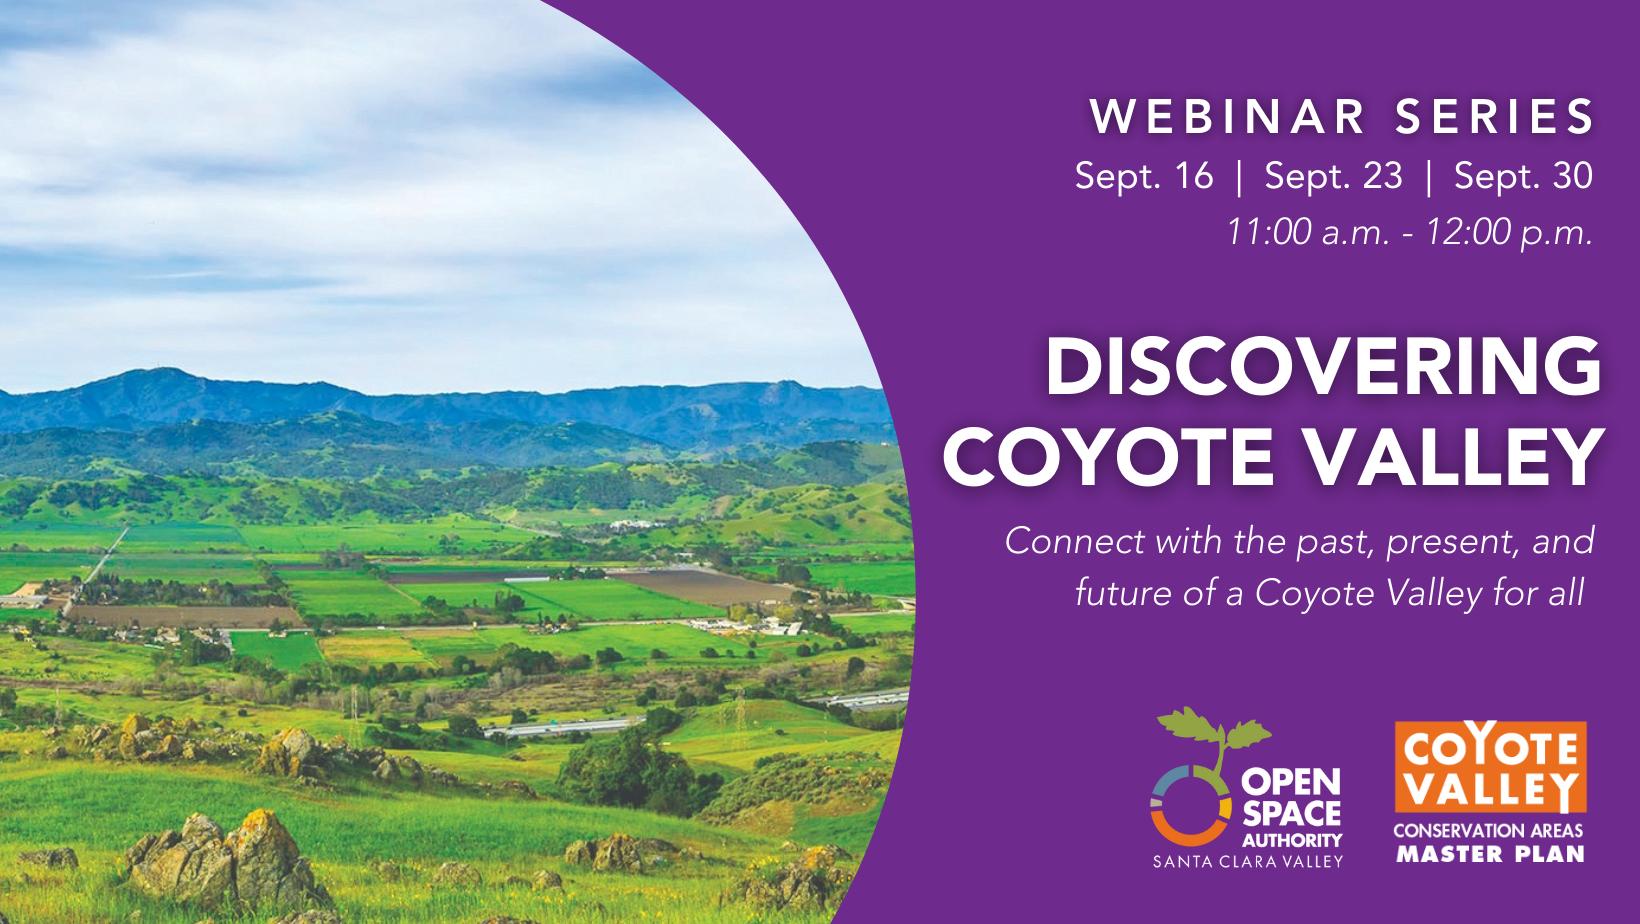 Discover Coyote Valley Webinar Series